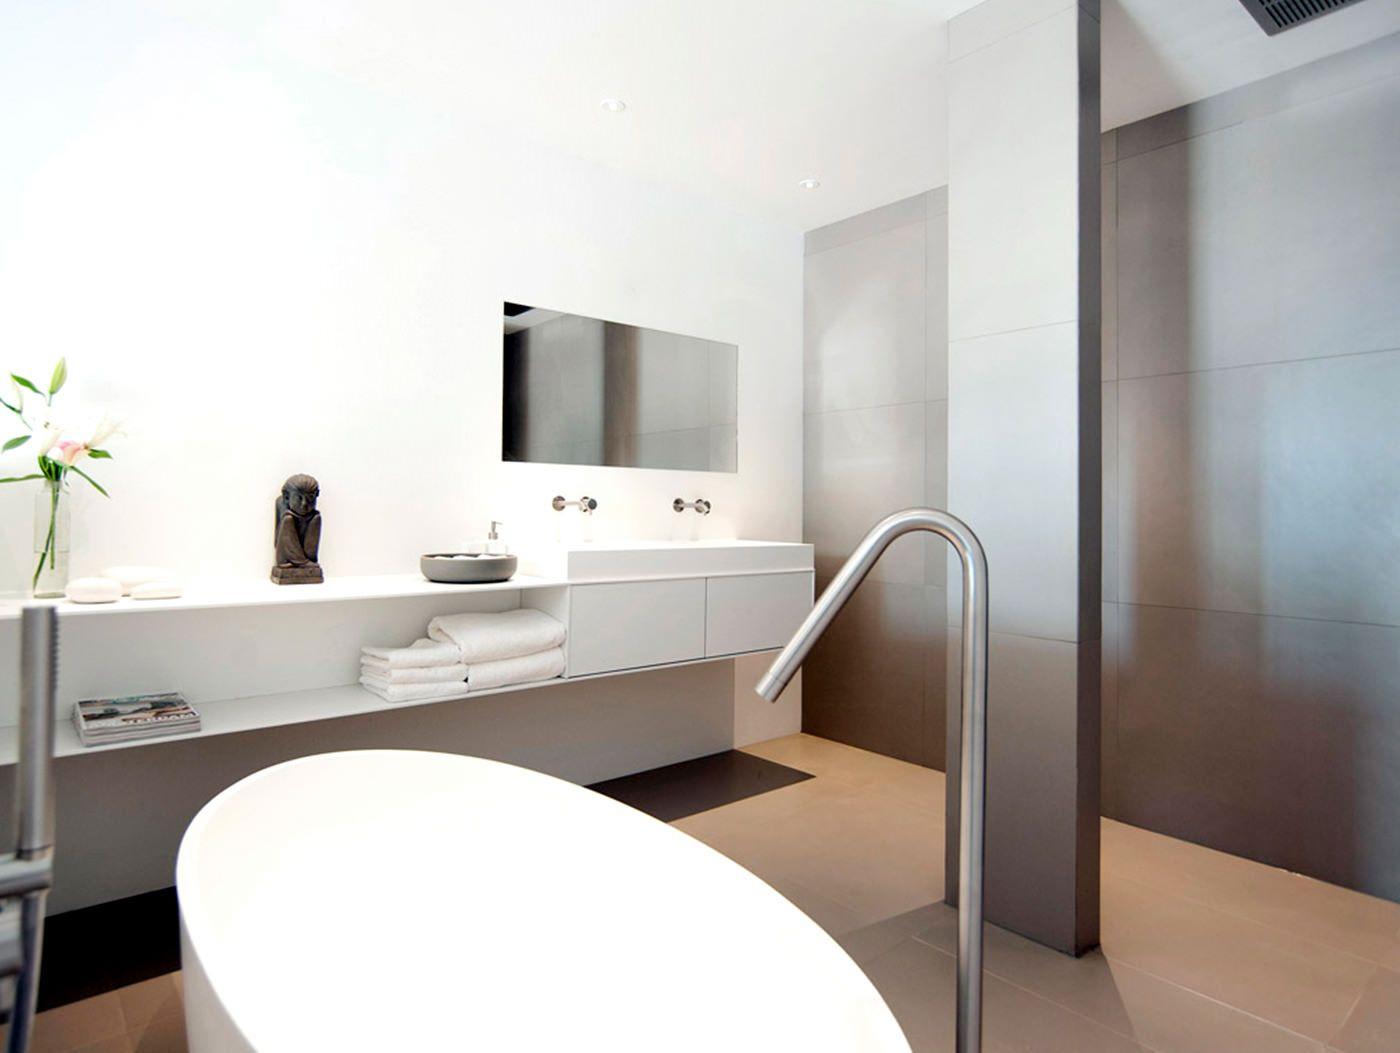 Bulthaup Showroom | BATHROOMS | Pinterest | Bathroom taps, Villa ...